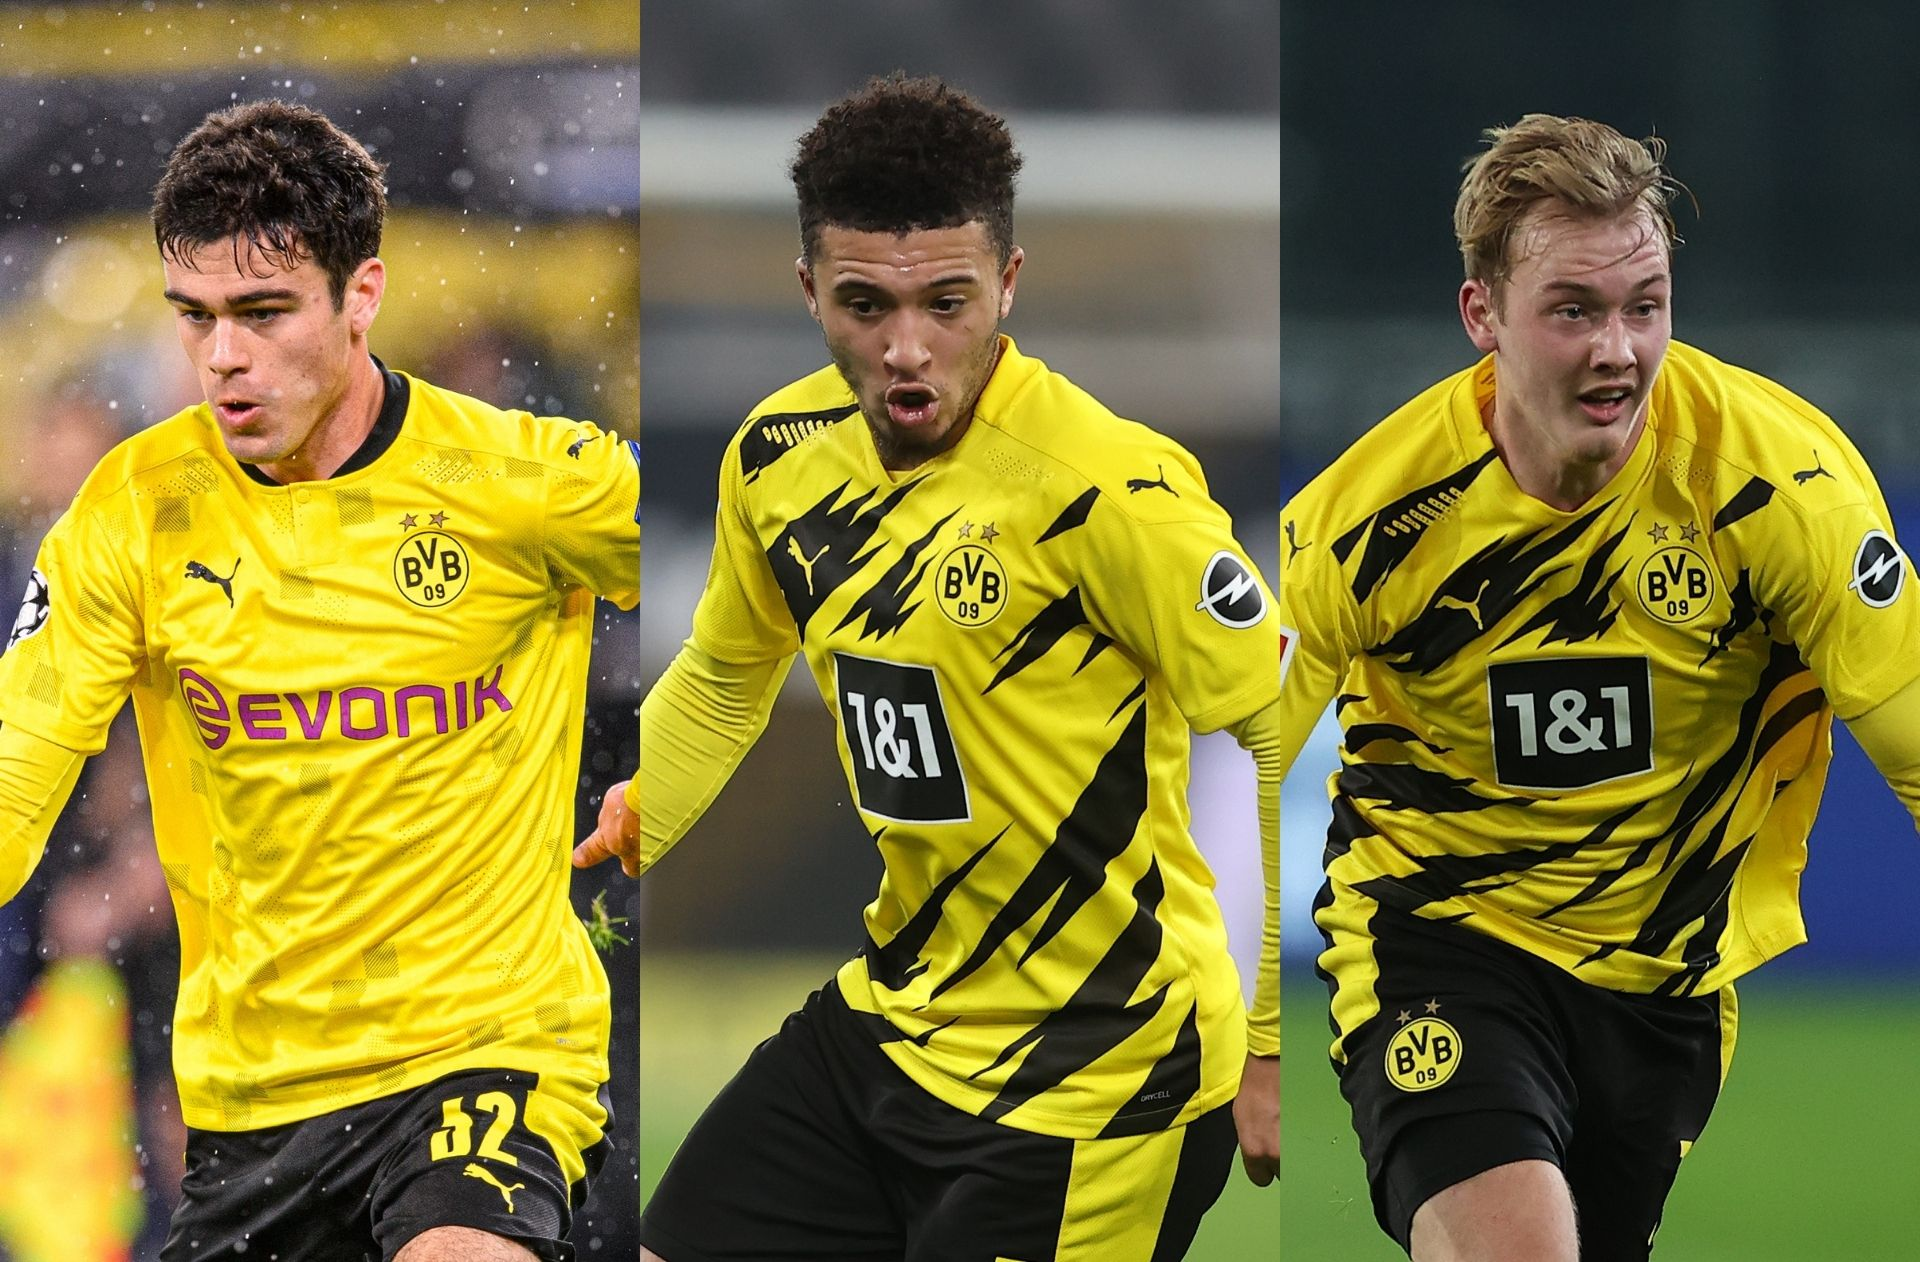 Giovanni Reyna, Jadon Sancho, Julian Brandt - Borussia Dortmund